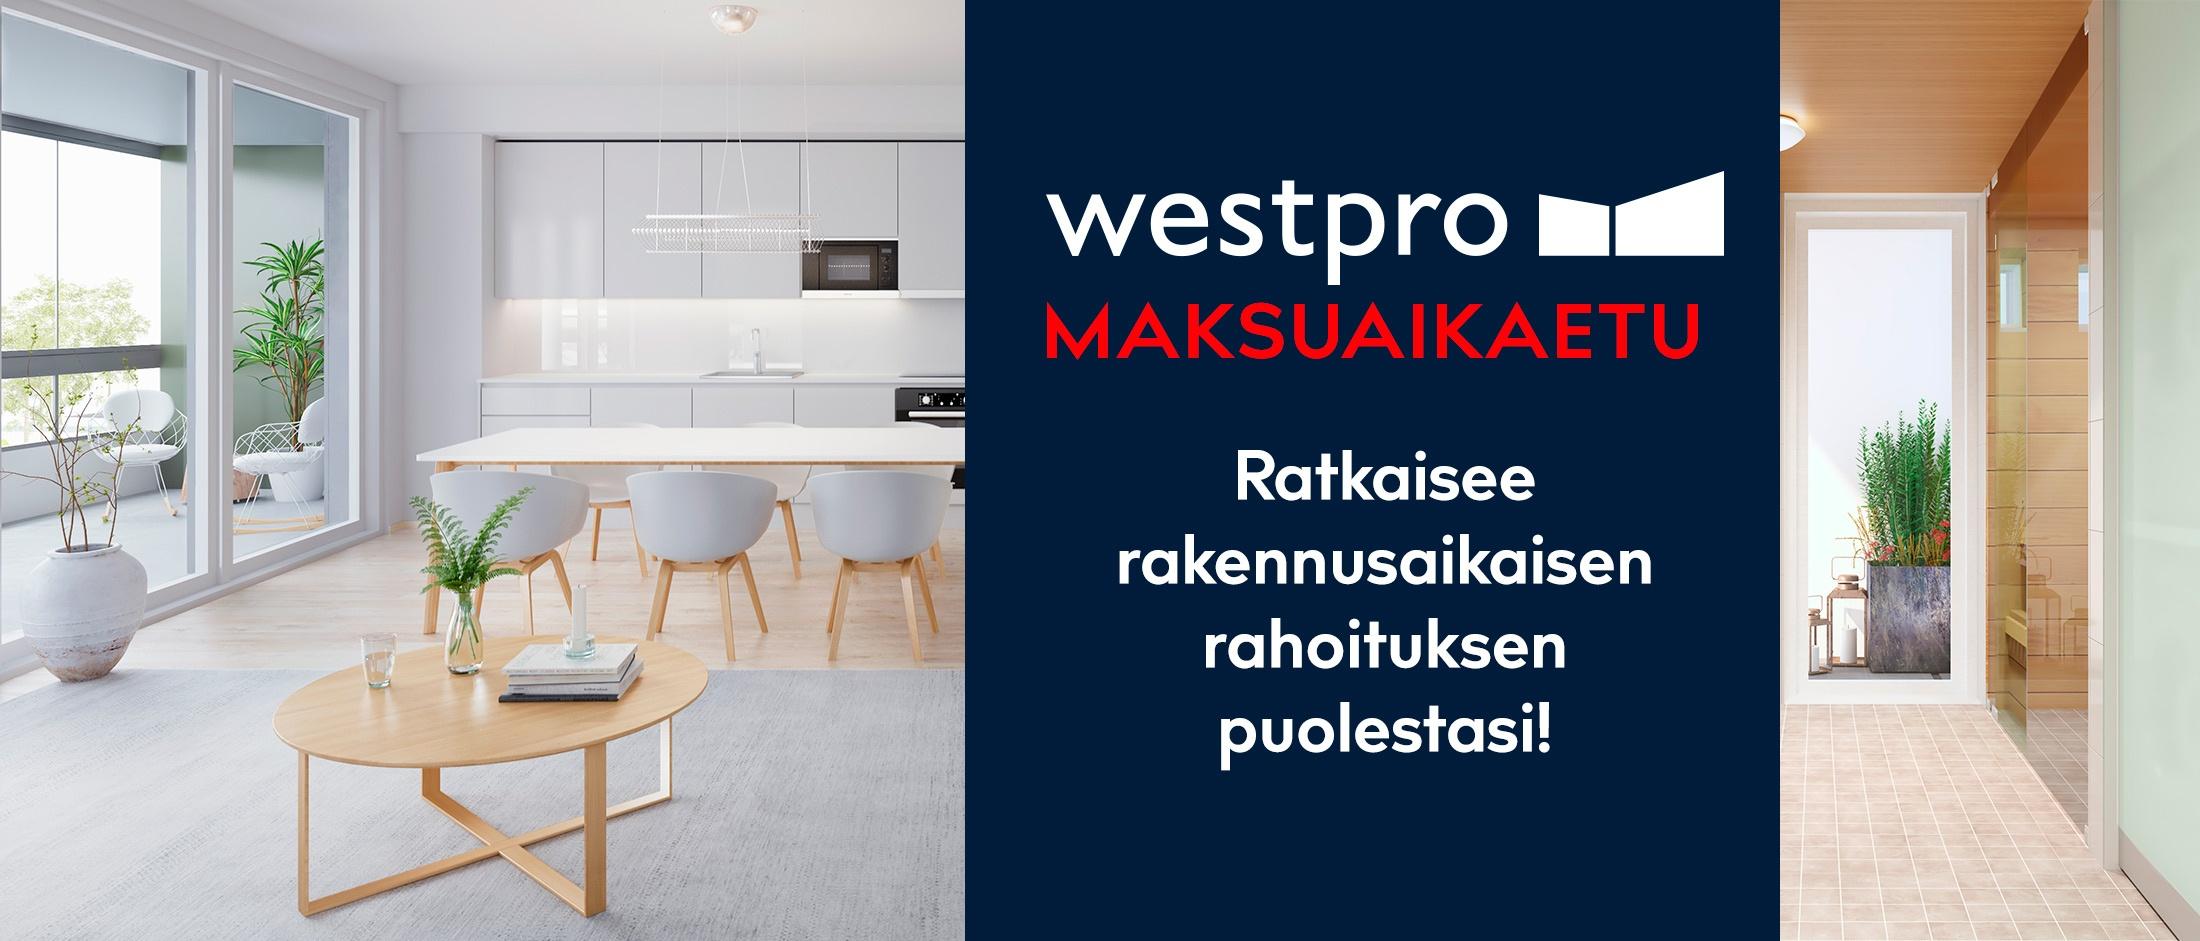 Westpro-maksuaikaetu2